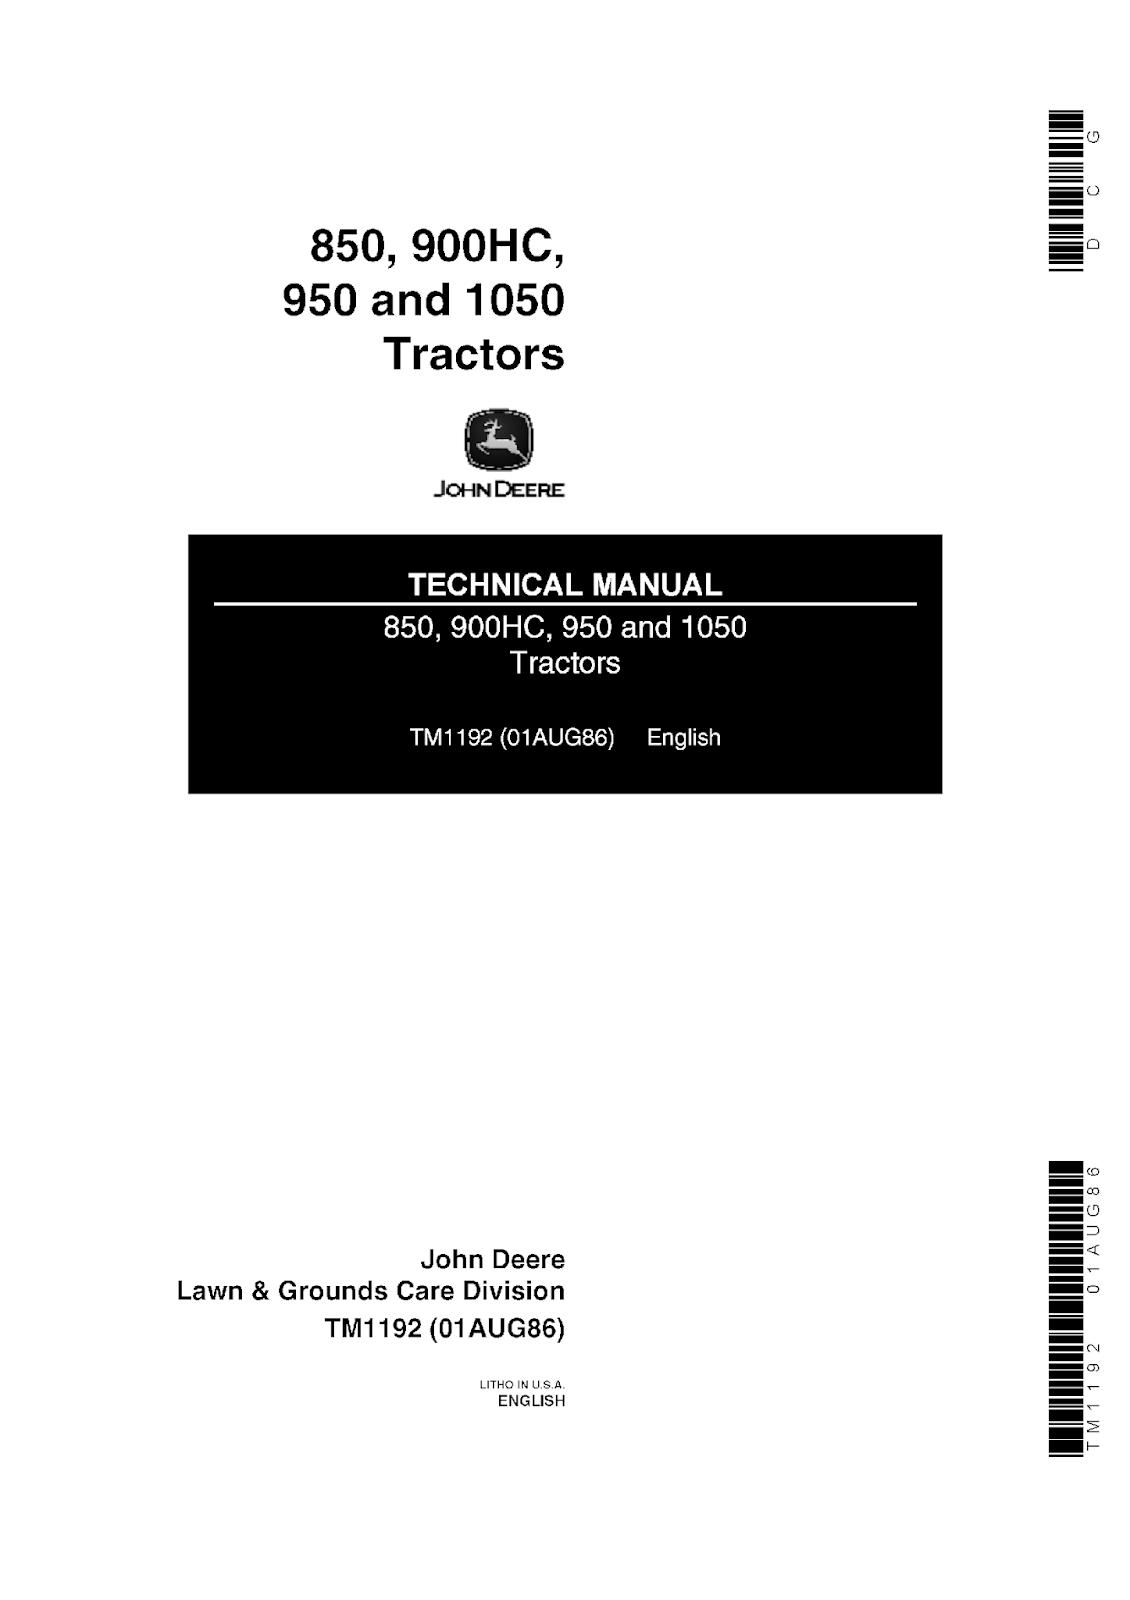 John Deere 850 900HC 950 1050 Tractors Technical Repair